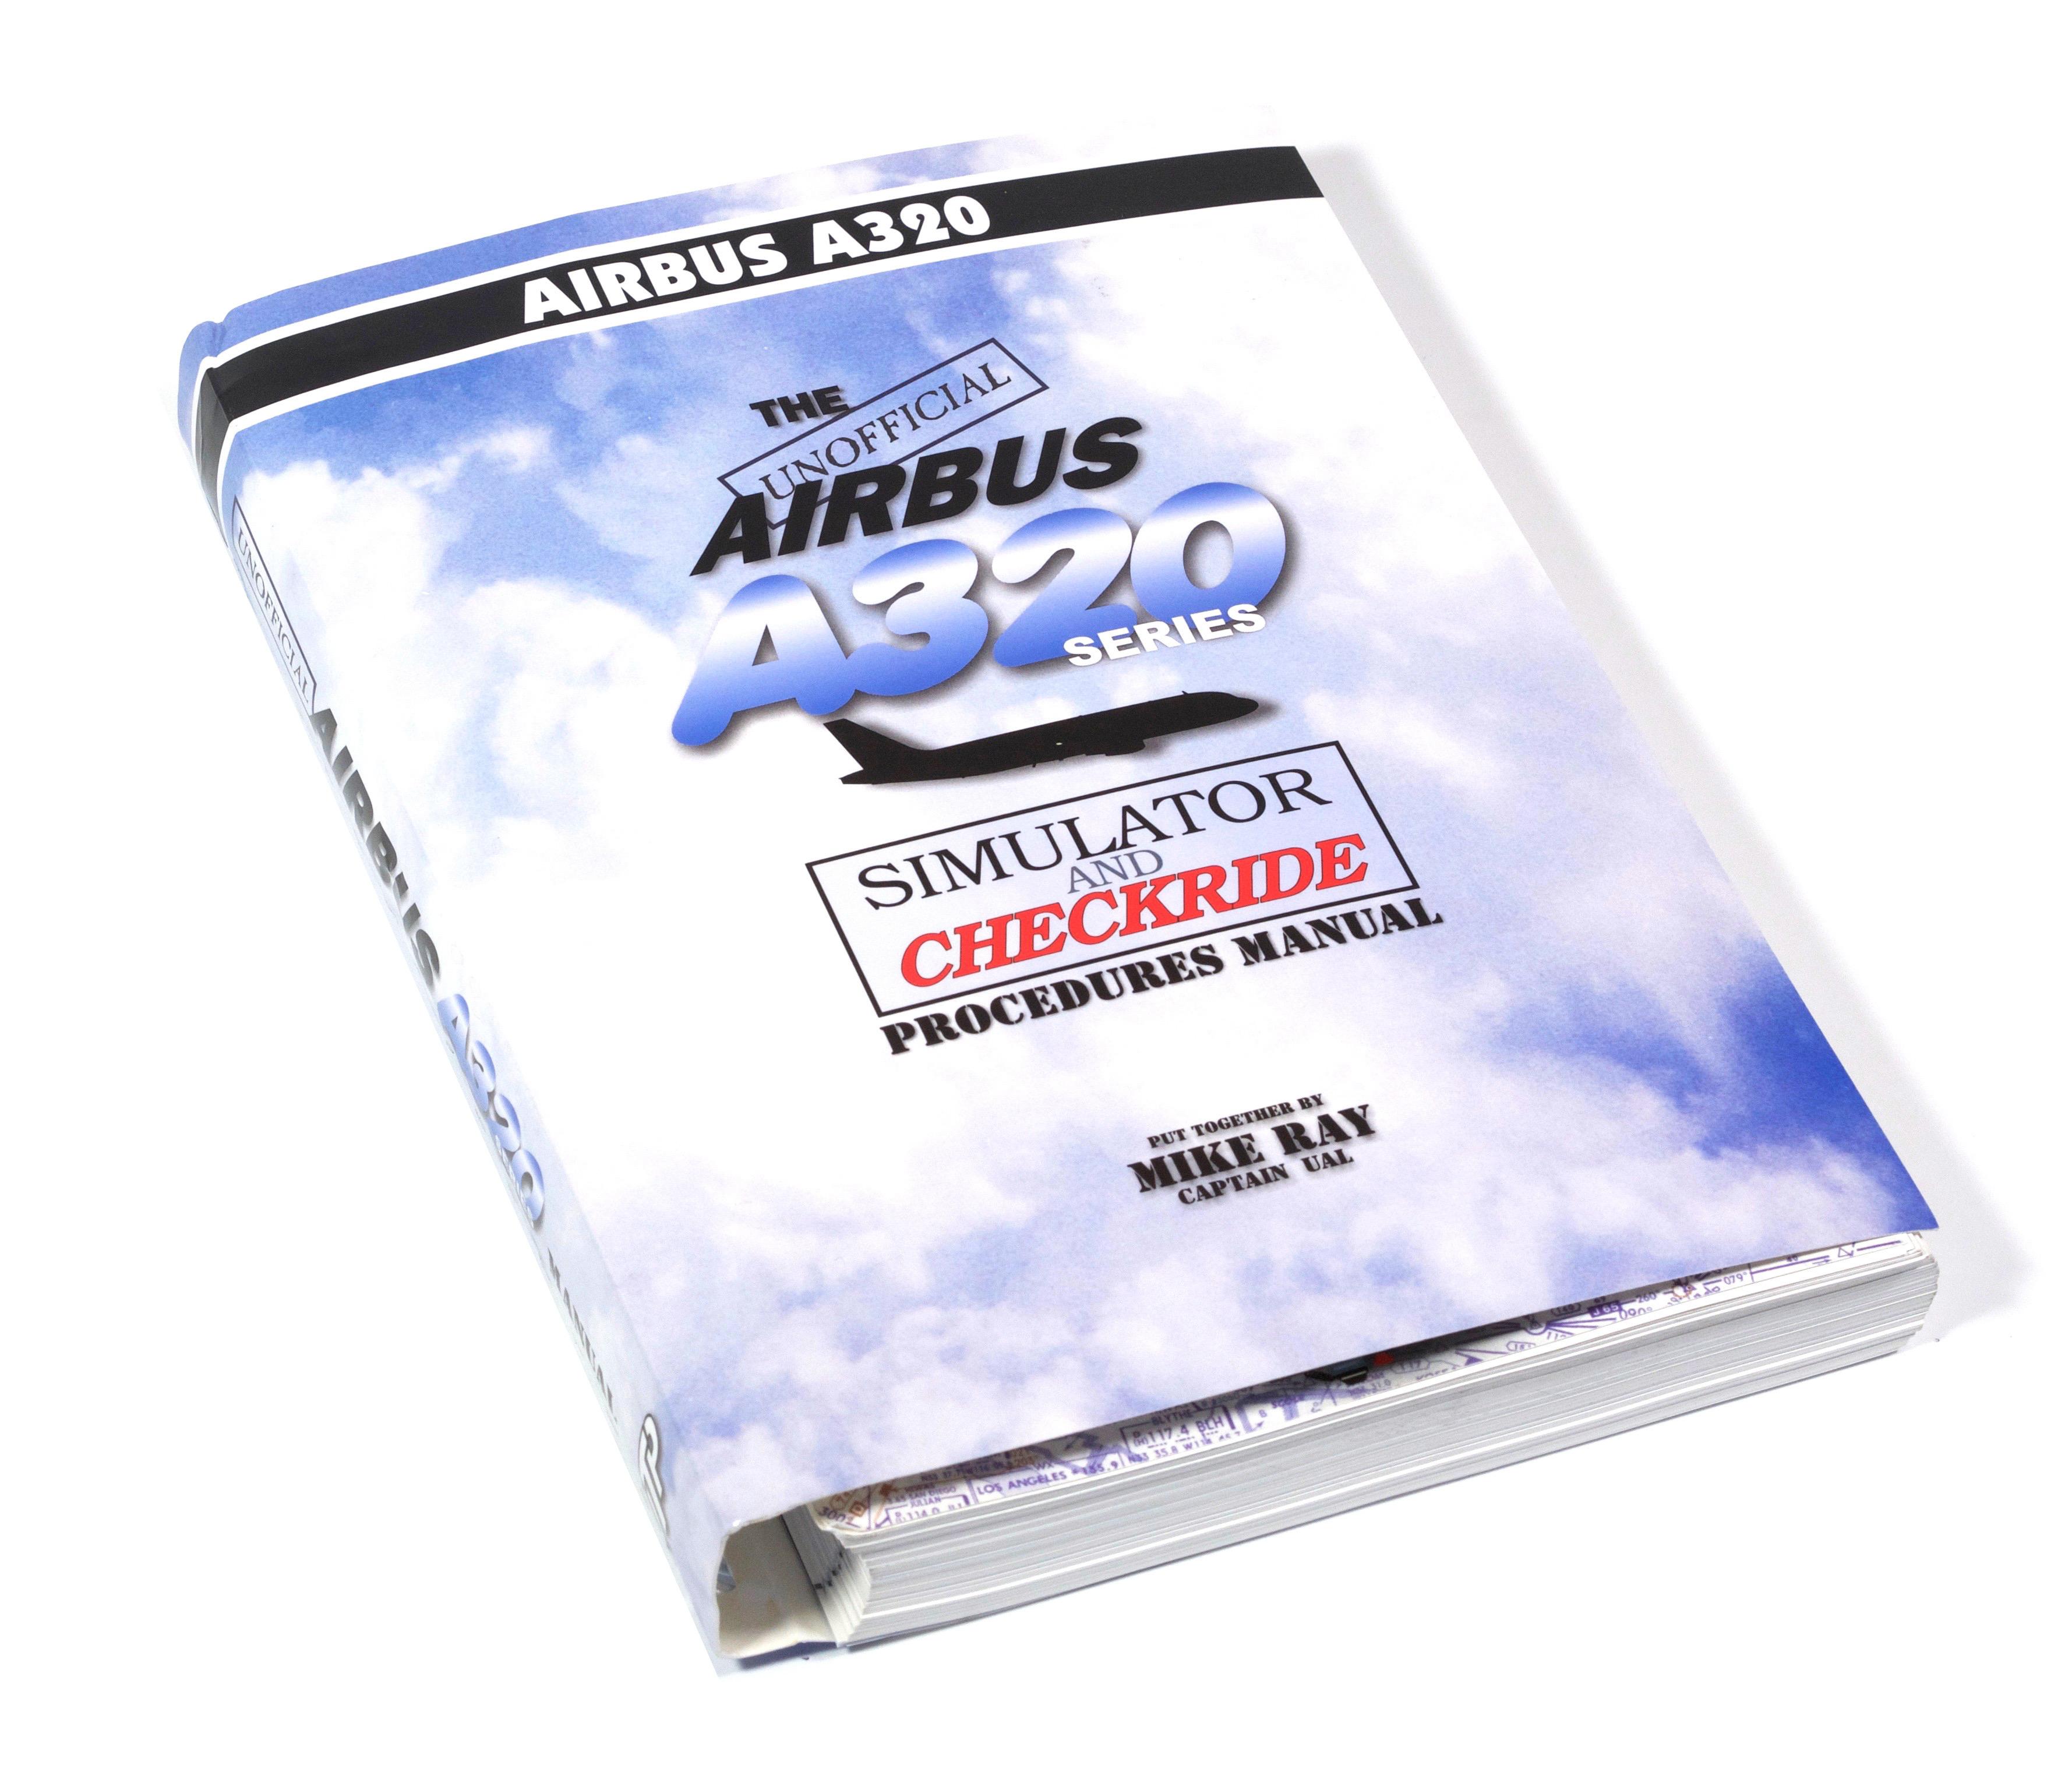 Airbus A318 Maintenance manual